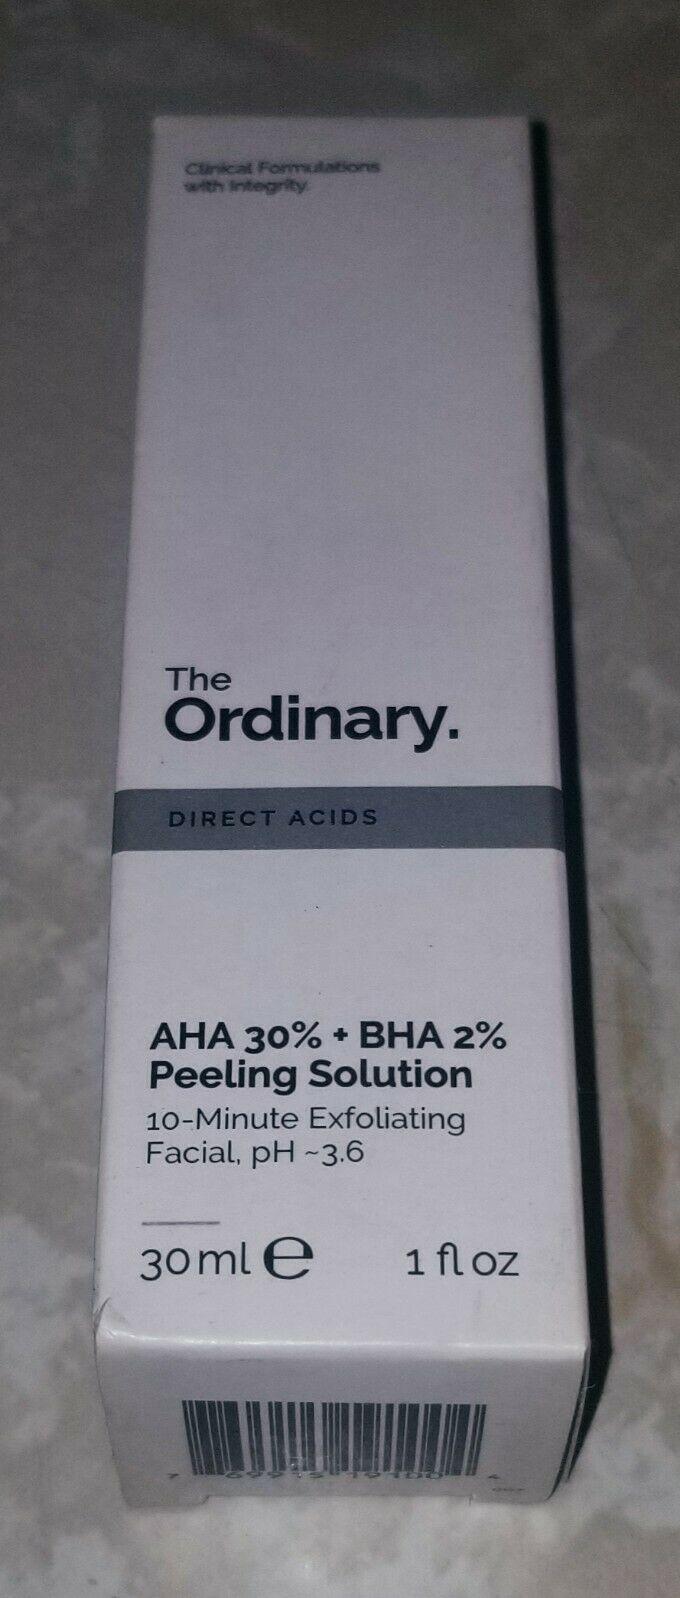 The Ordinary - AHA 30% + BHA 2% Peeling Solution - NIB Authentic 1oz/30ml 1